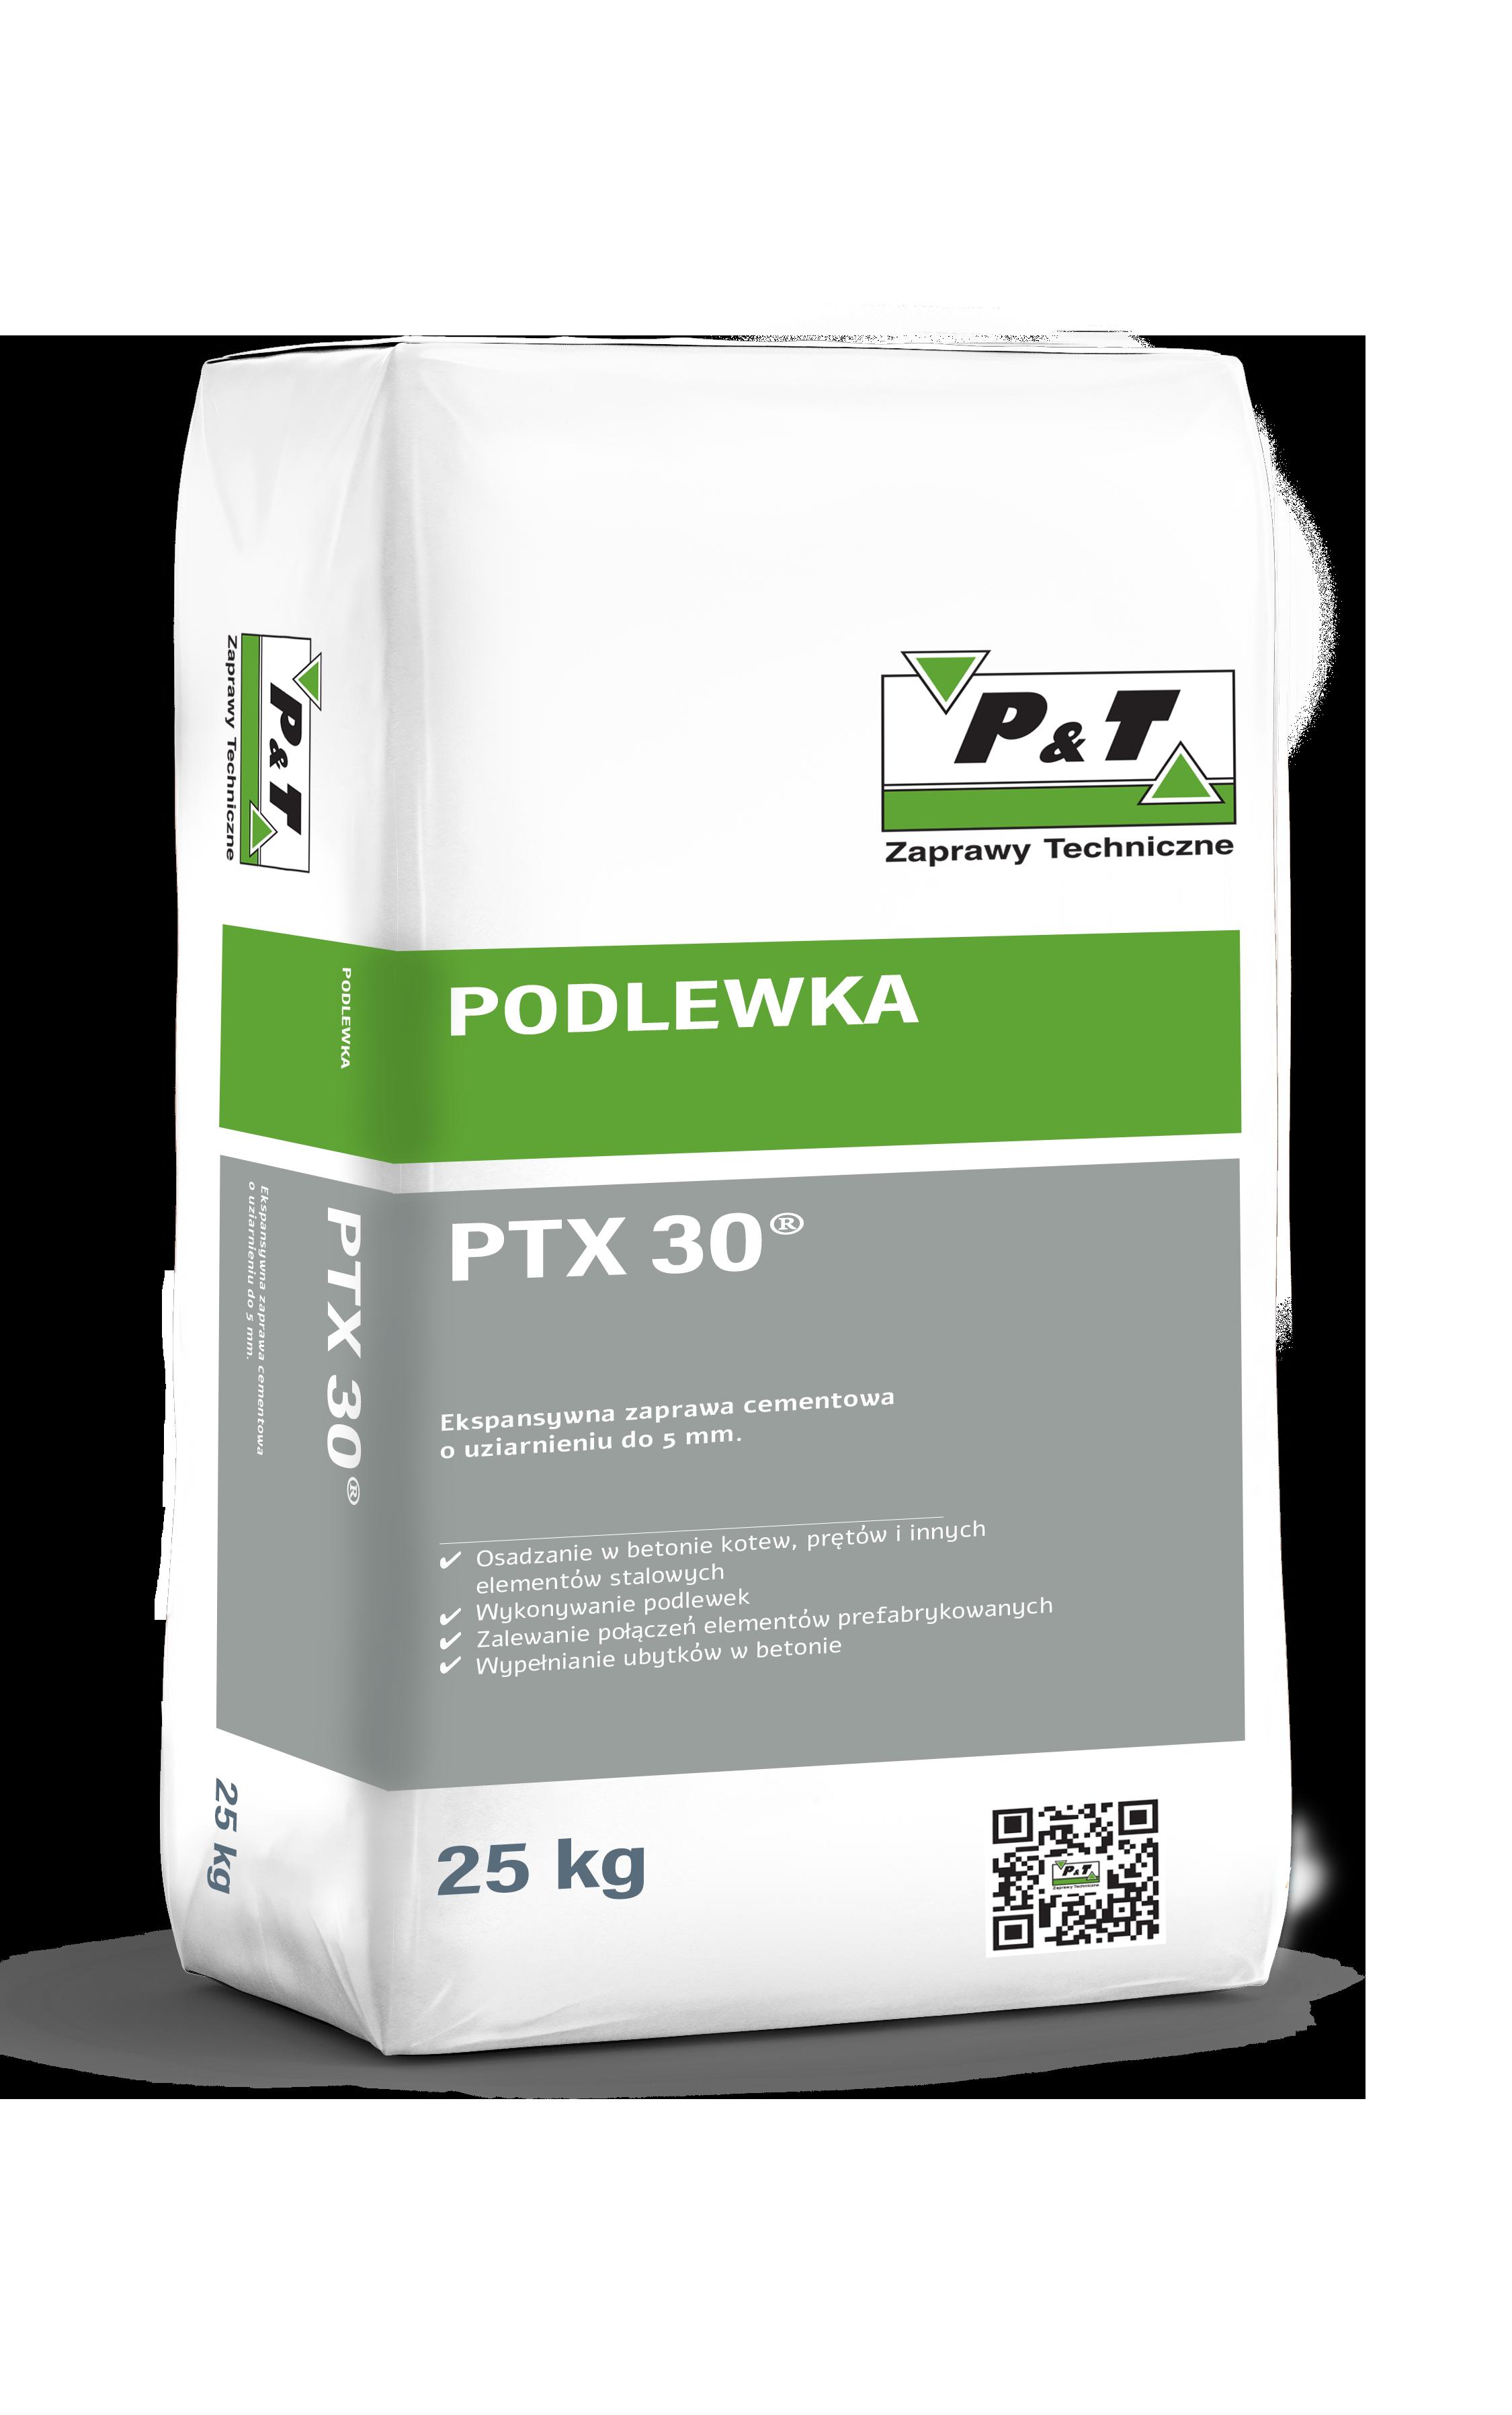 PTX 30